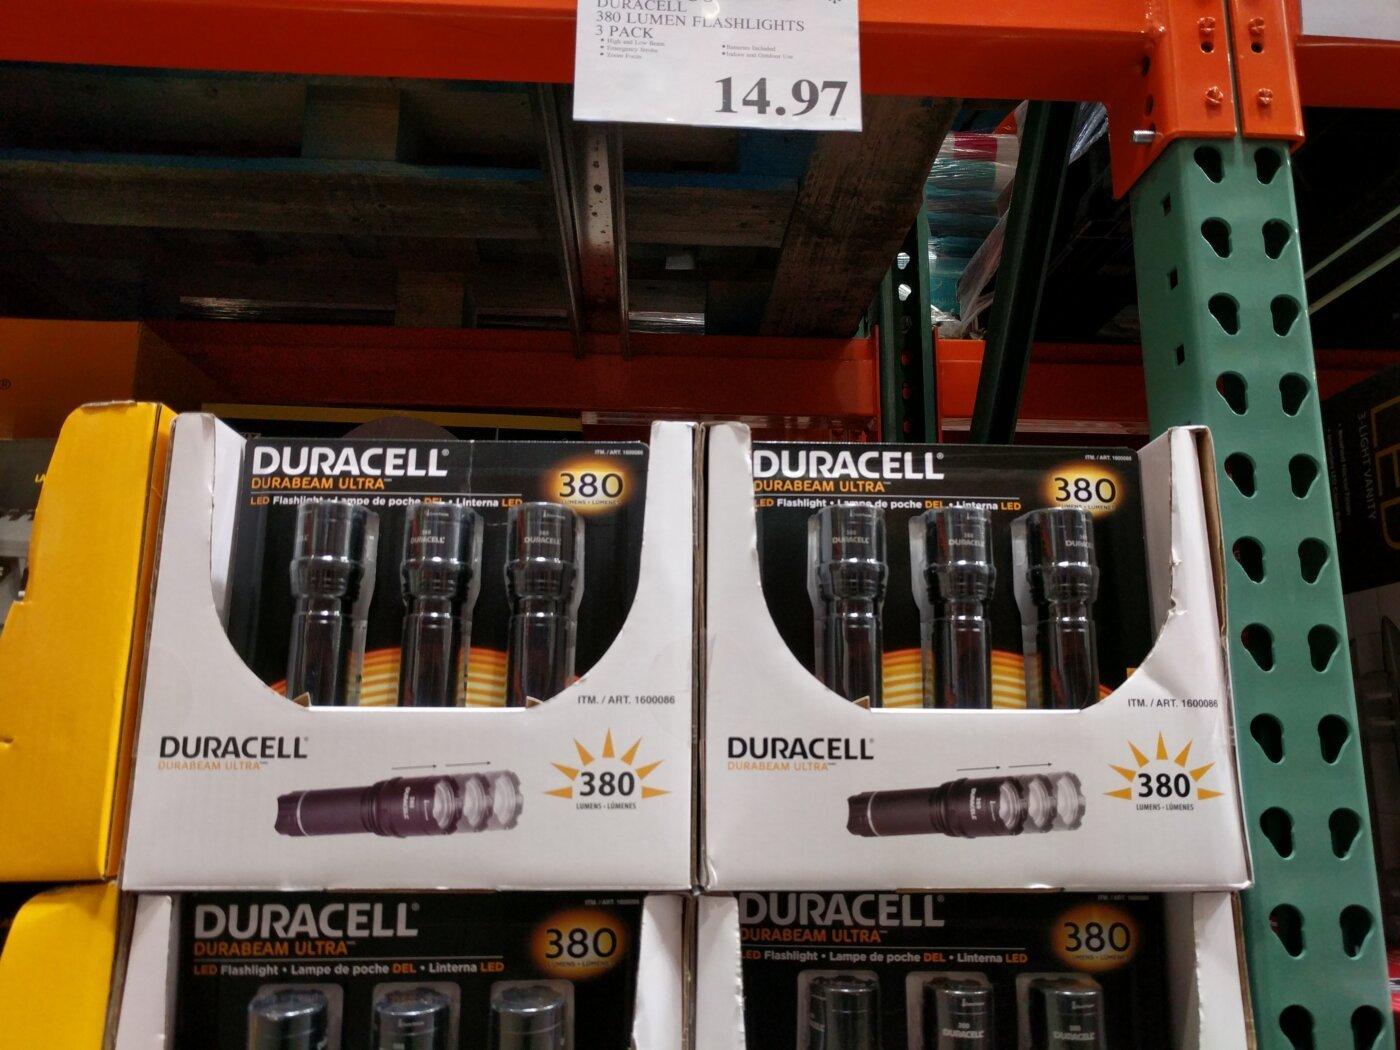 3 Pack 380 Lumen Led Duracell Flashlights Y7ybgfv6